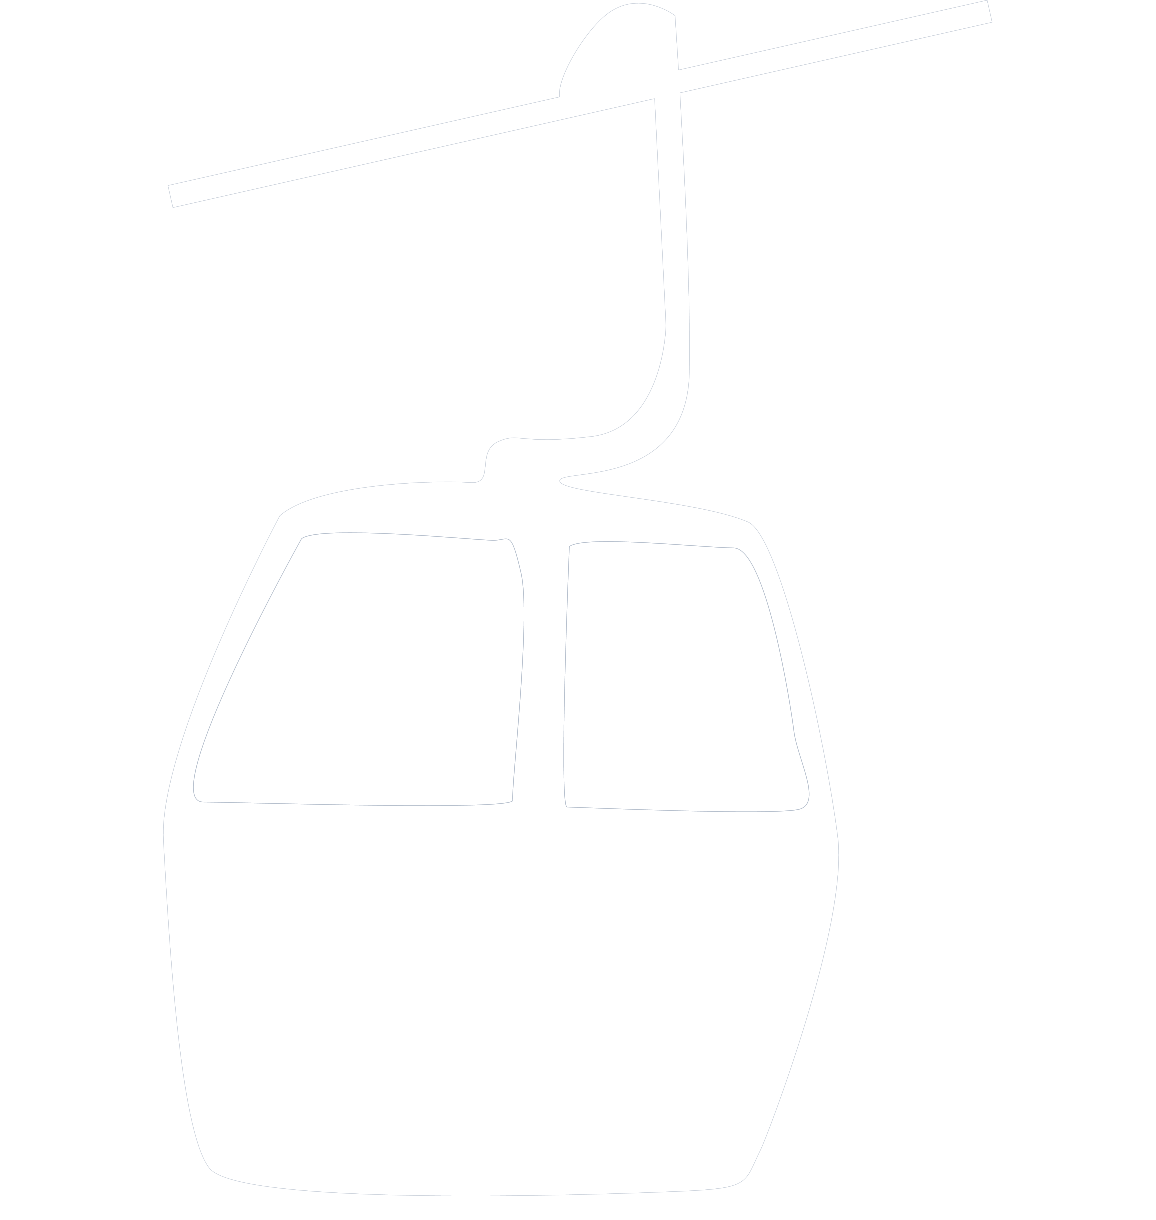 EUB (Einseil-Umlauf-Bahn)